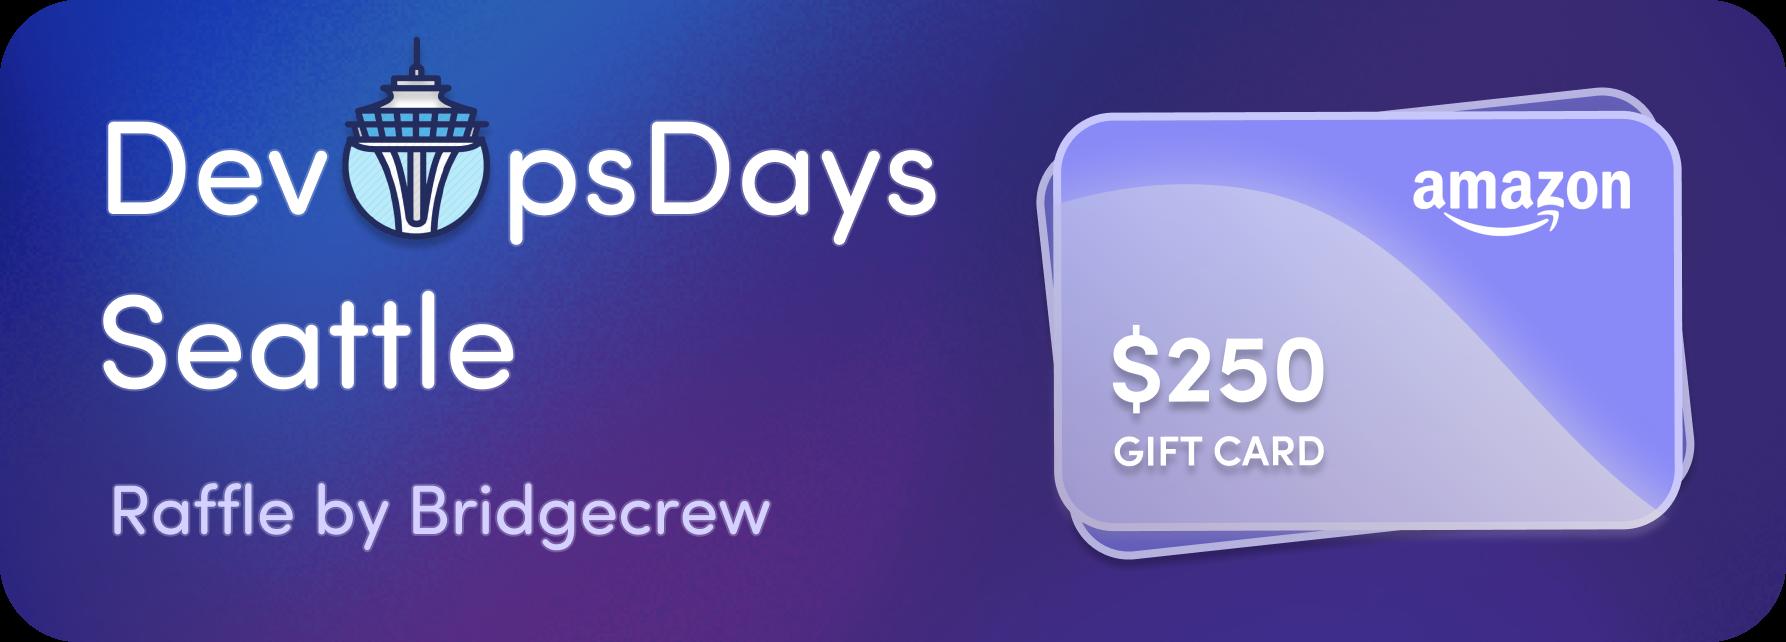 Bridgecrew $250 Amazon Gift Card Raffle at DevOpsDays Seattle